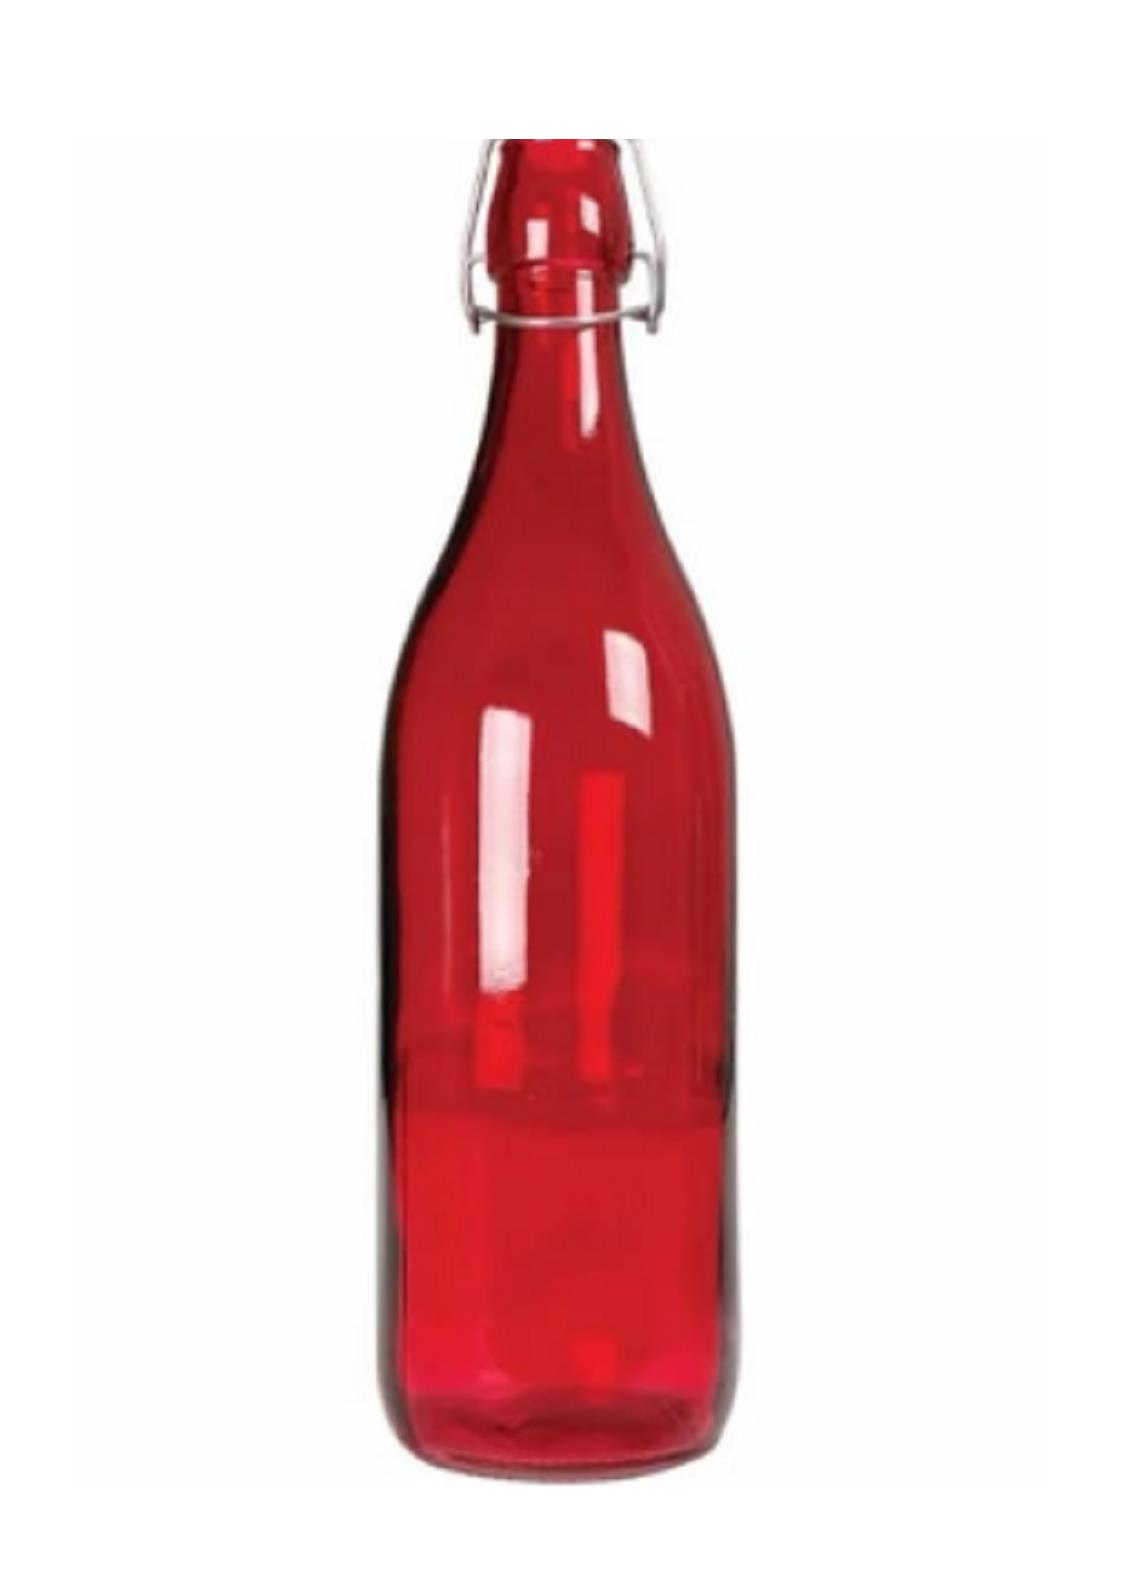 Garrafa De Água 1 Litro Vidro C/ Fechamento Hermético